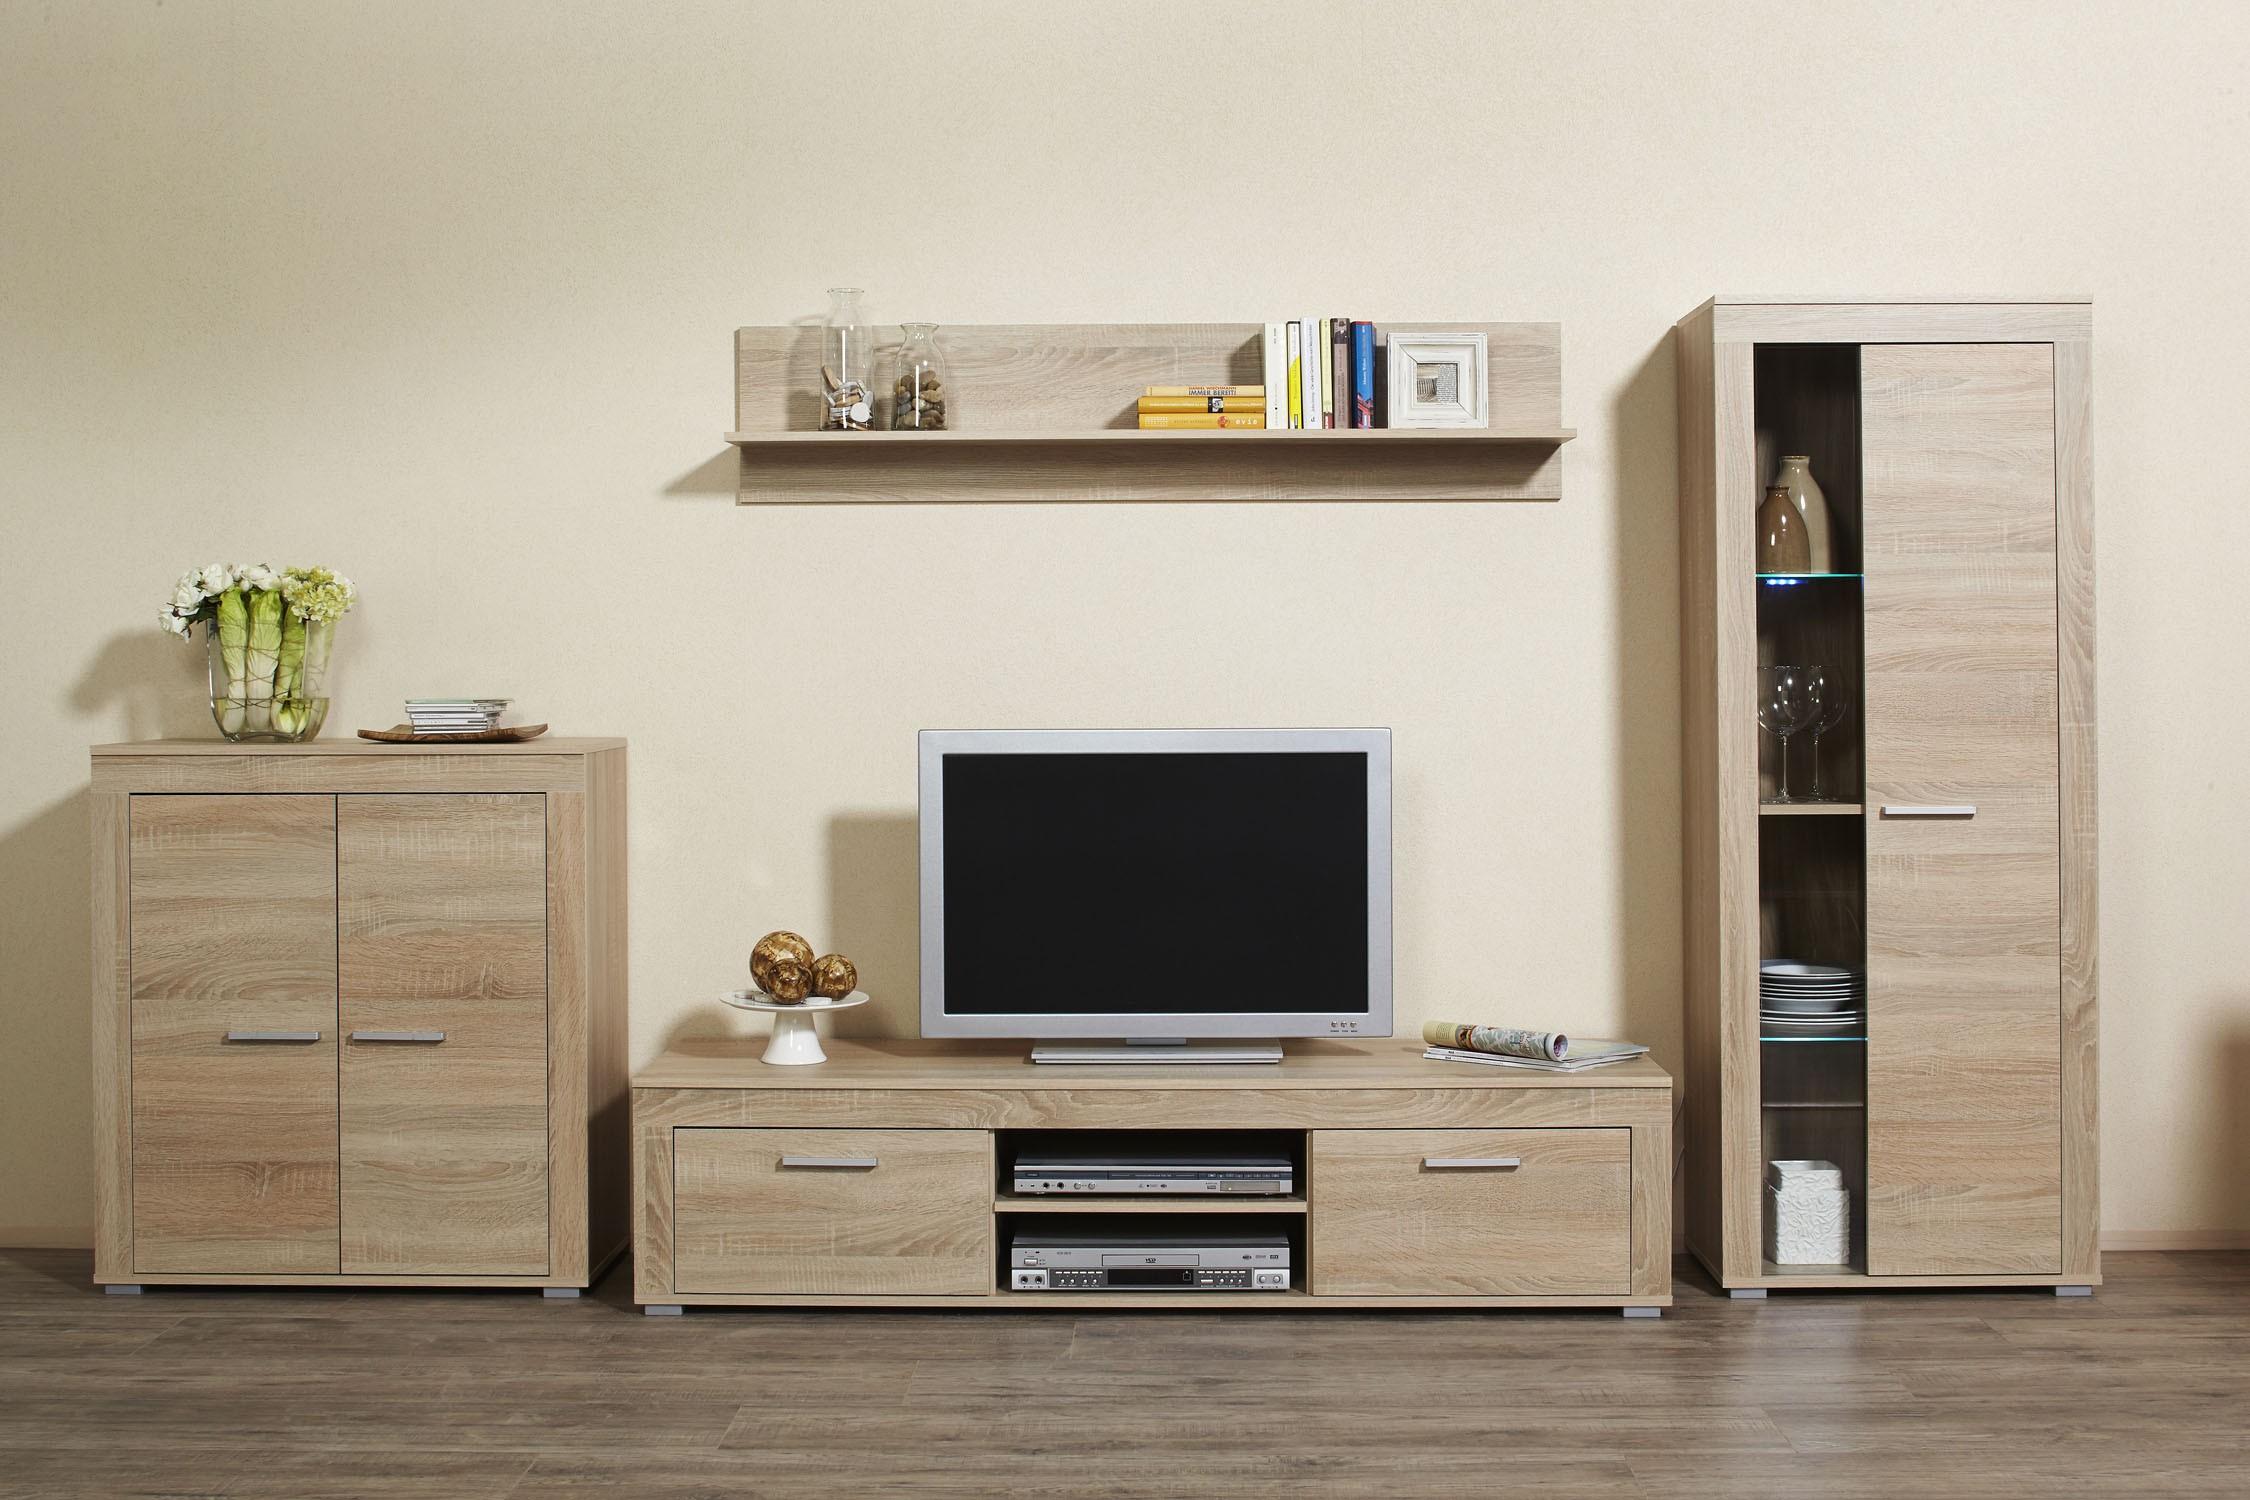 4tlg wohnwand anbauwand mod w038 es sonoma eiche s gerau h c m bel. Black Bedroom Furniture Sets. Home Design Ideas